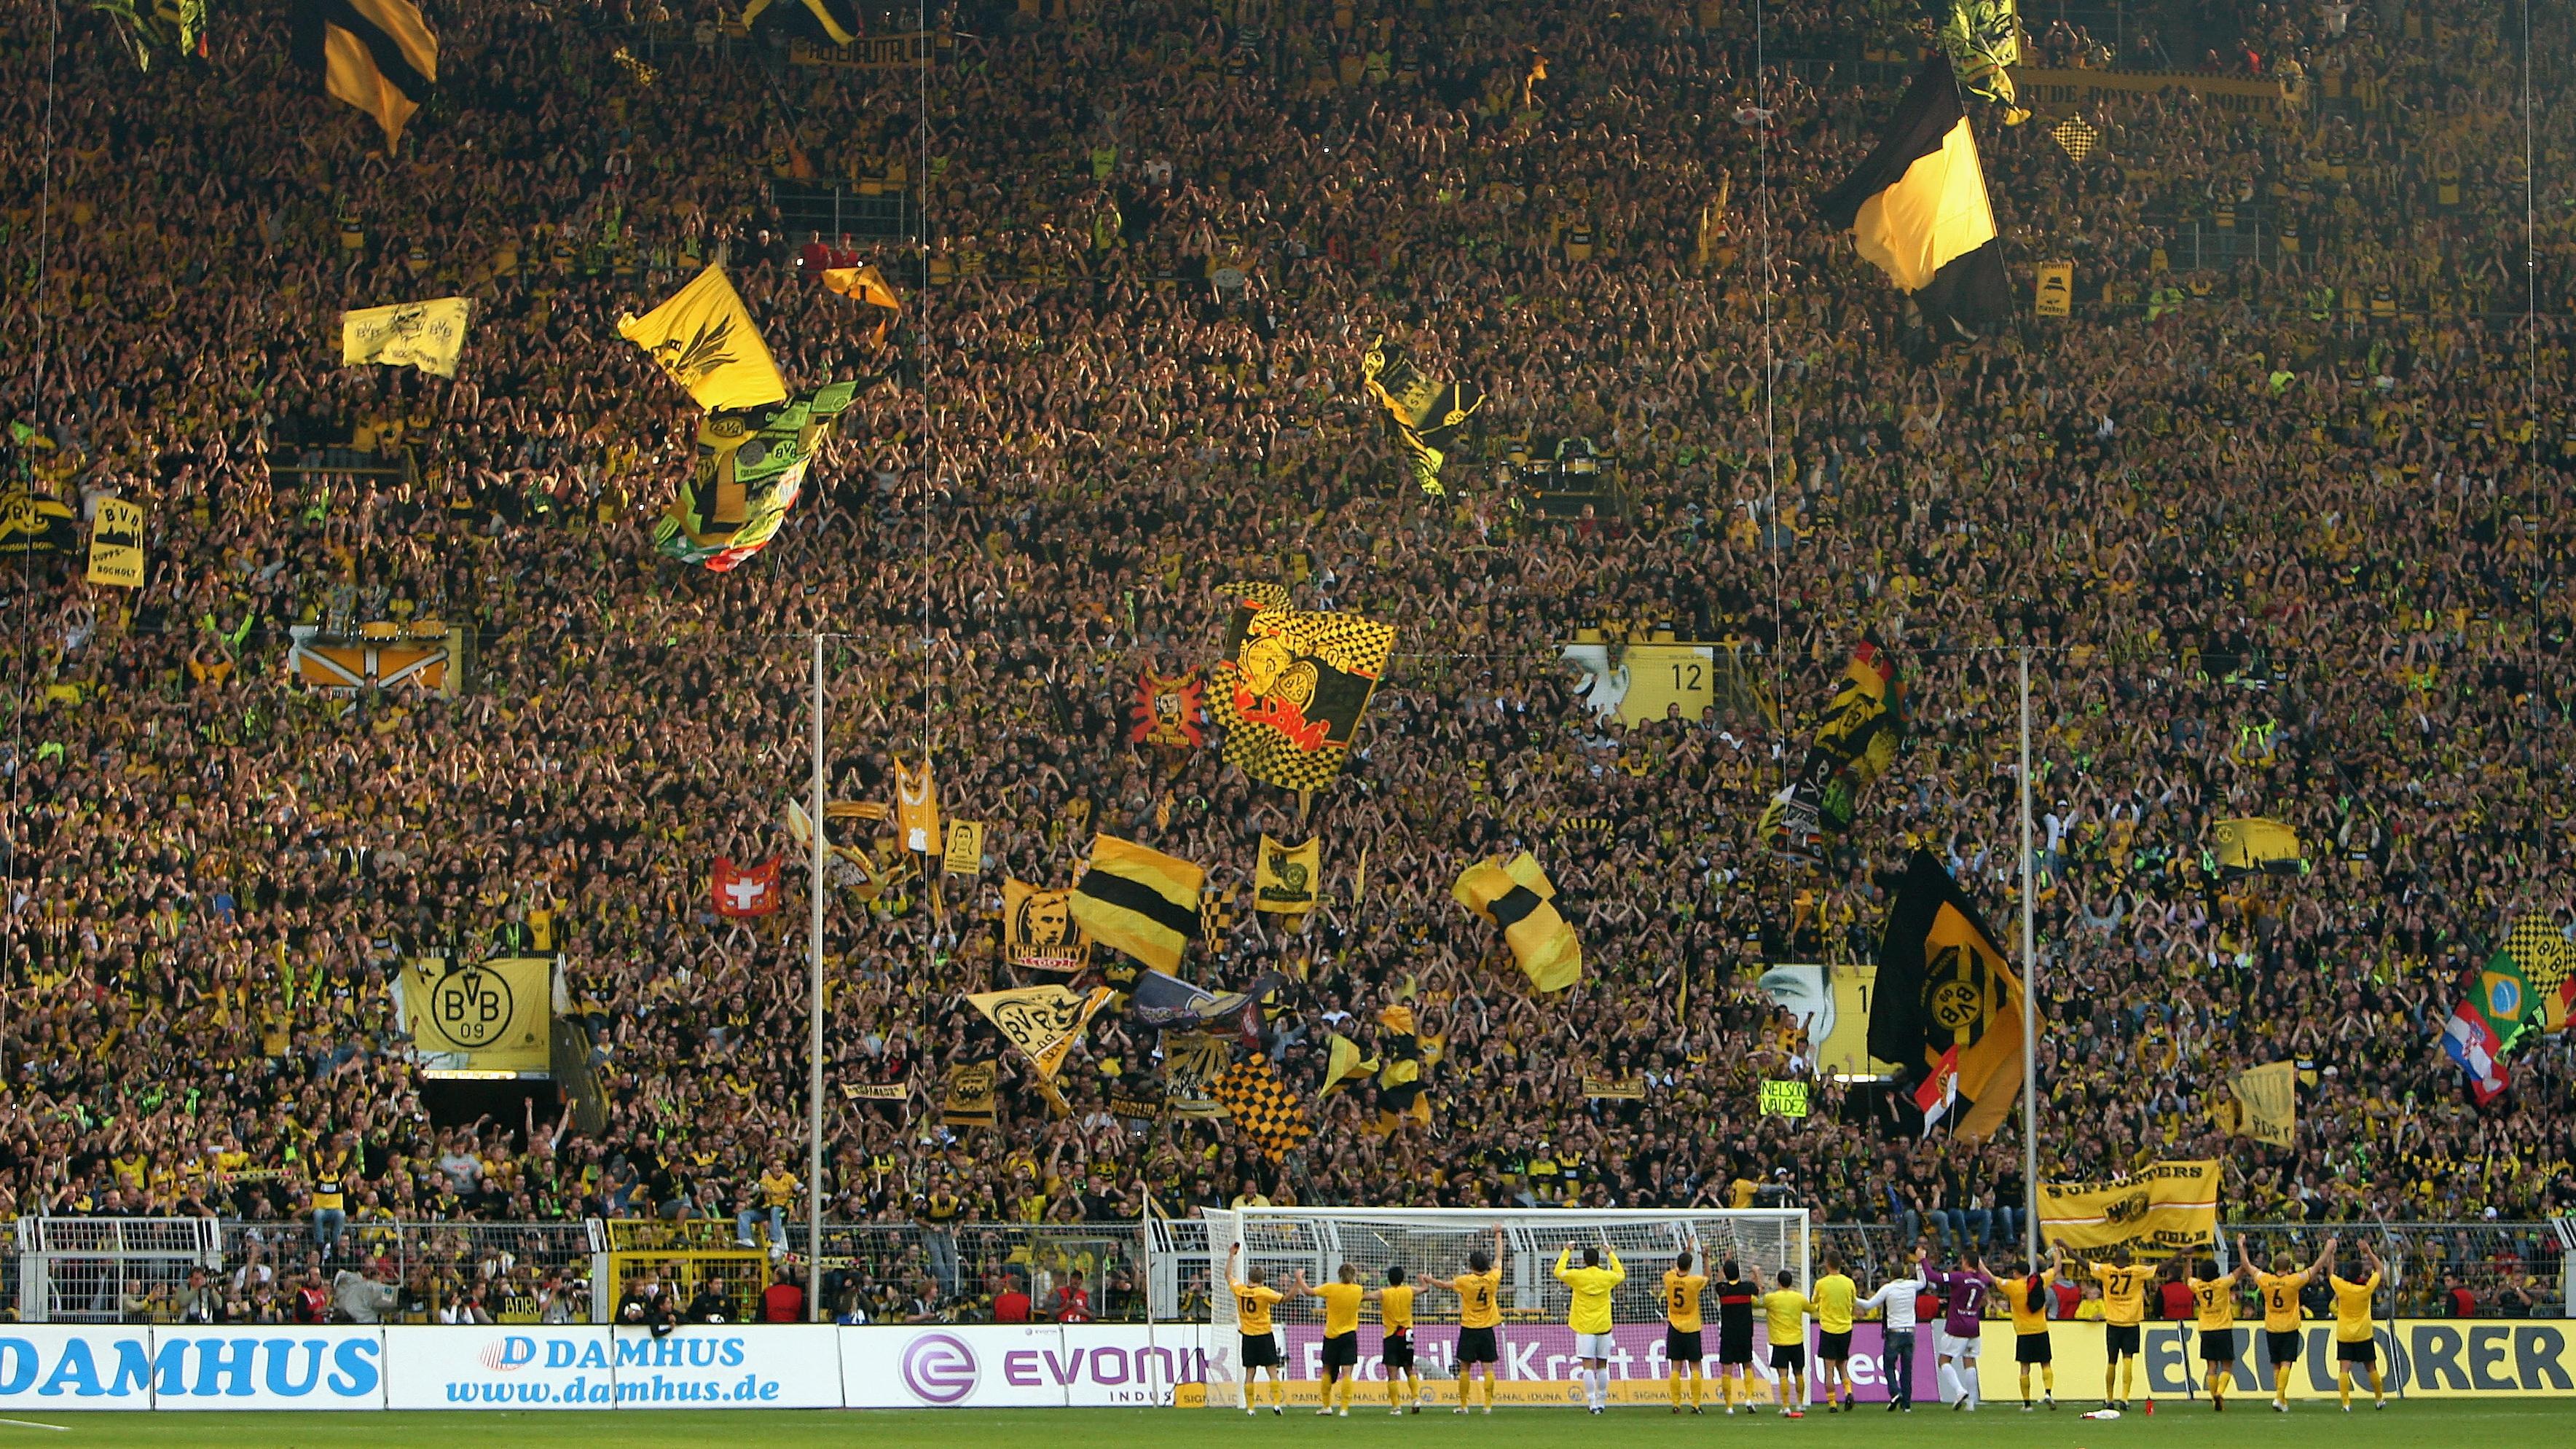 Signal Iduna Park Borussia Dortmund